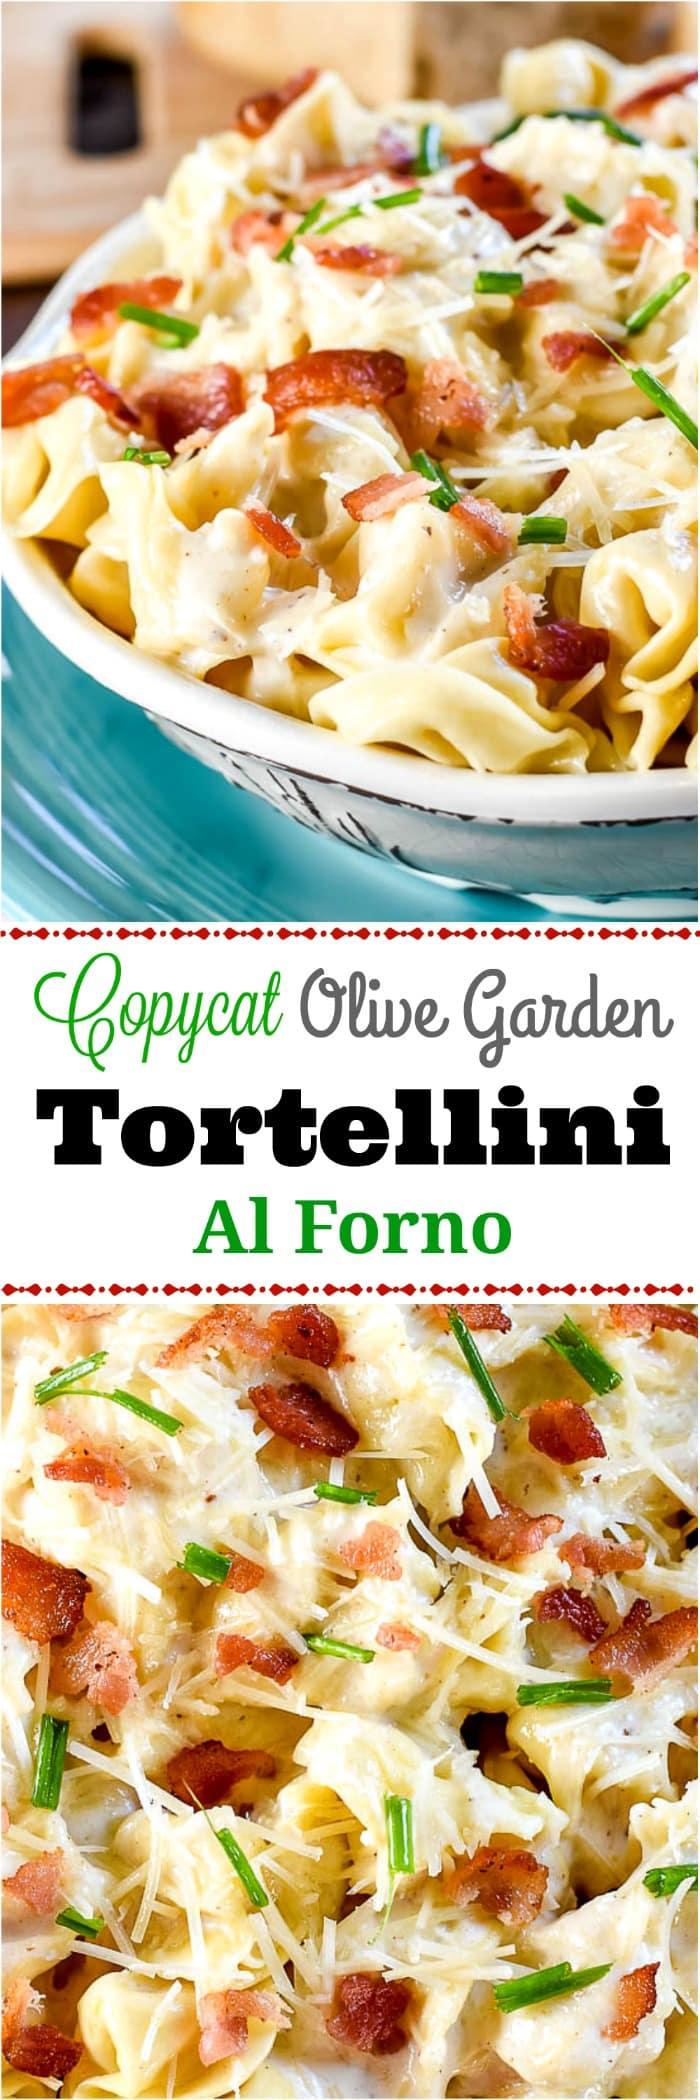 Copycat Olive Garden Tortellini Al Forno